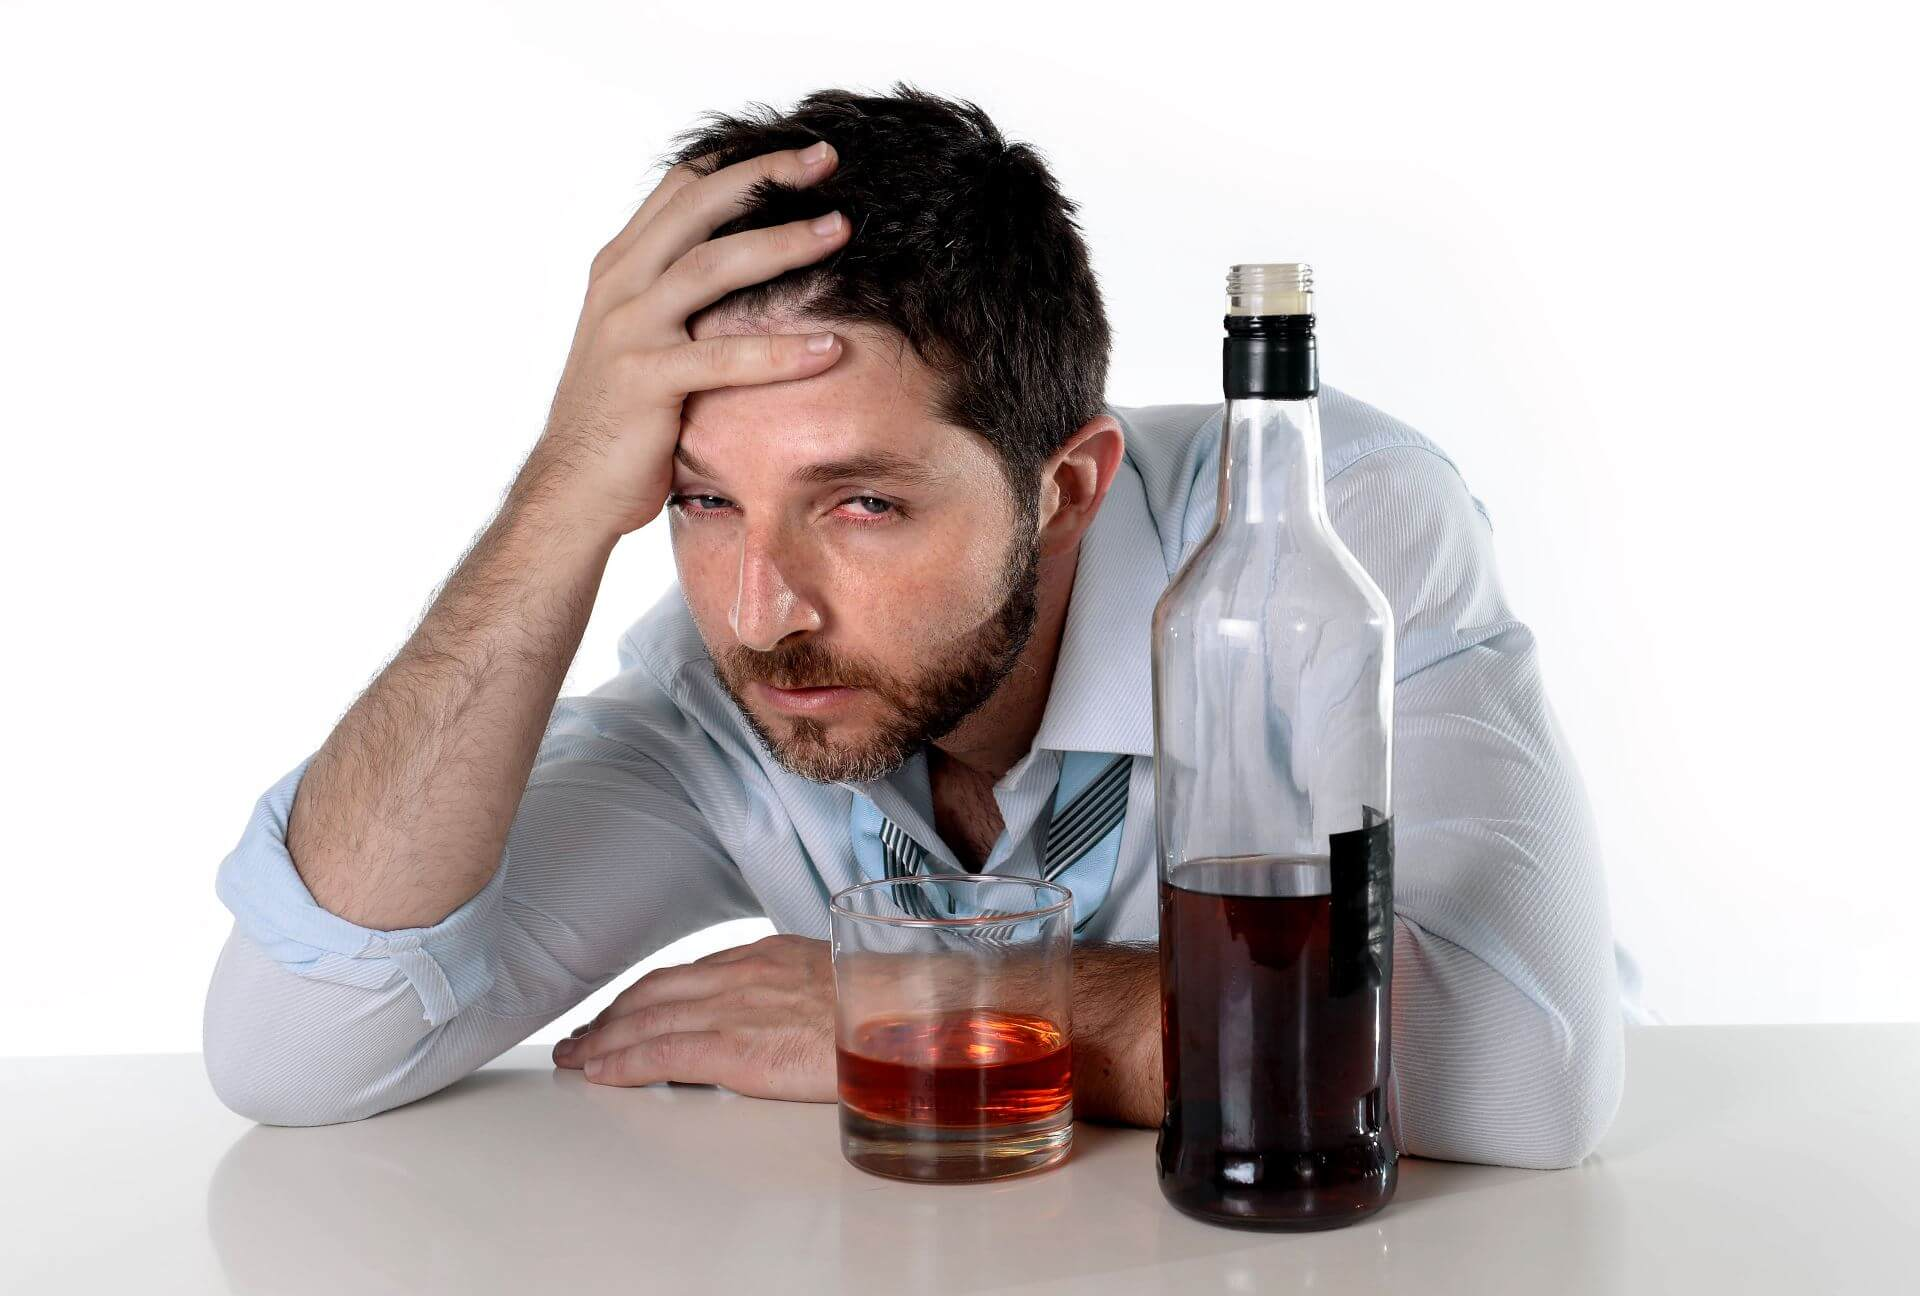 лечение алкоголизма препар